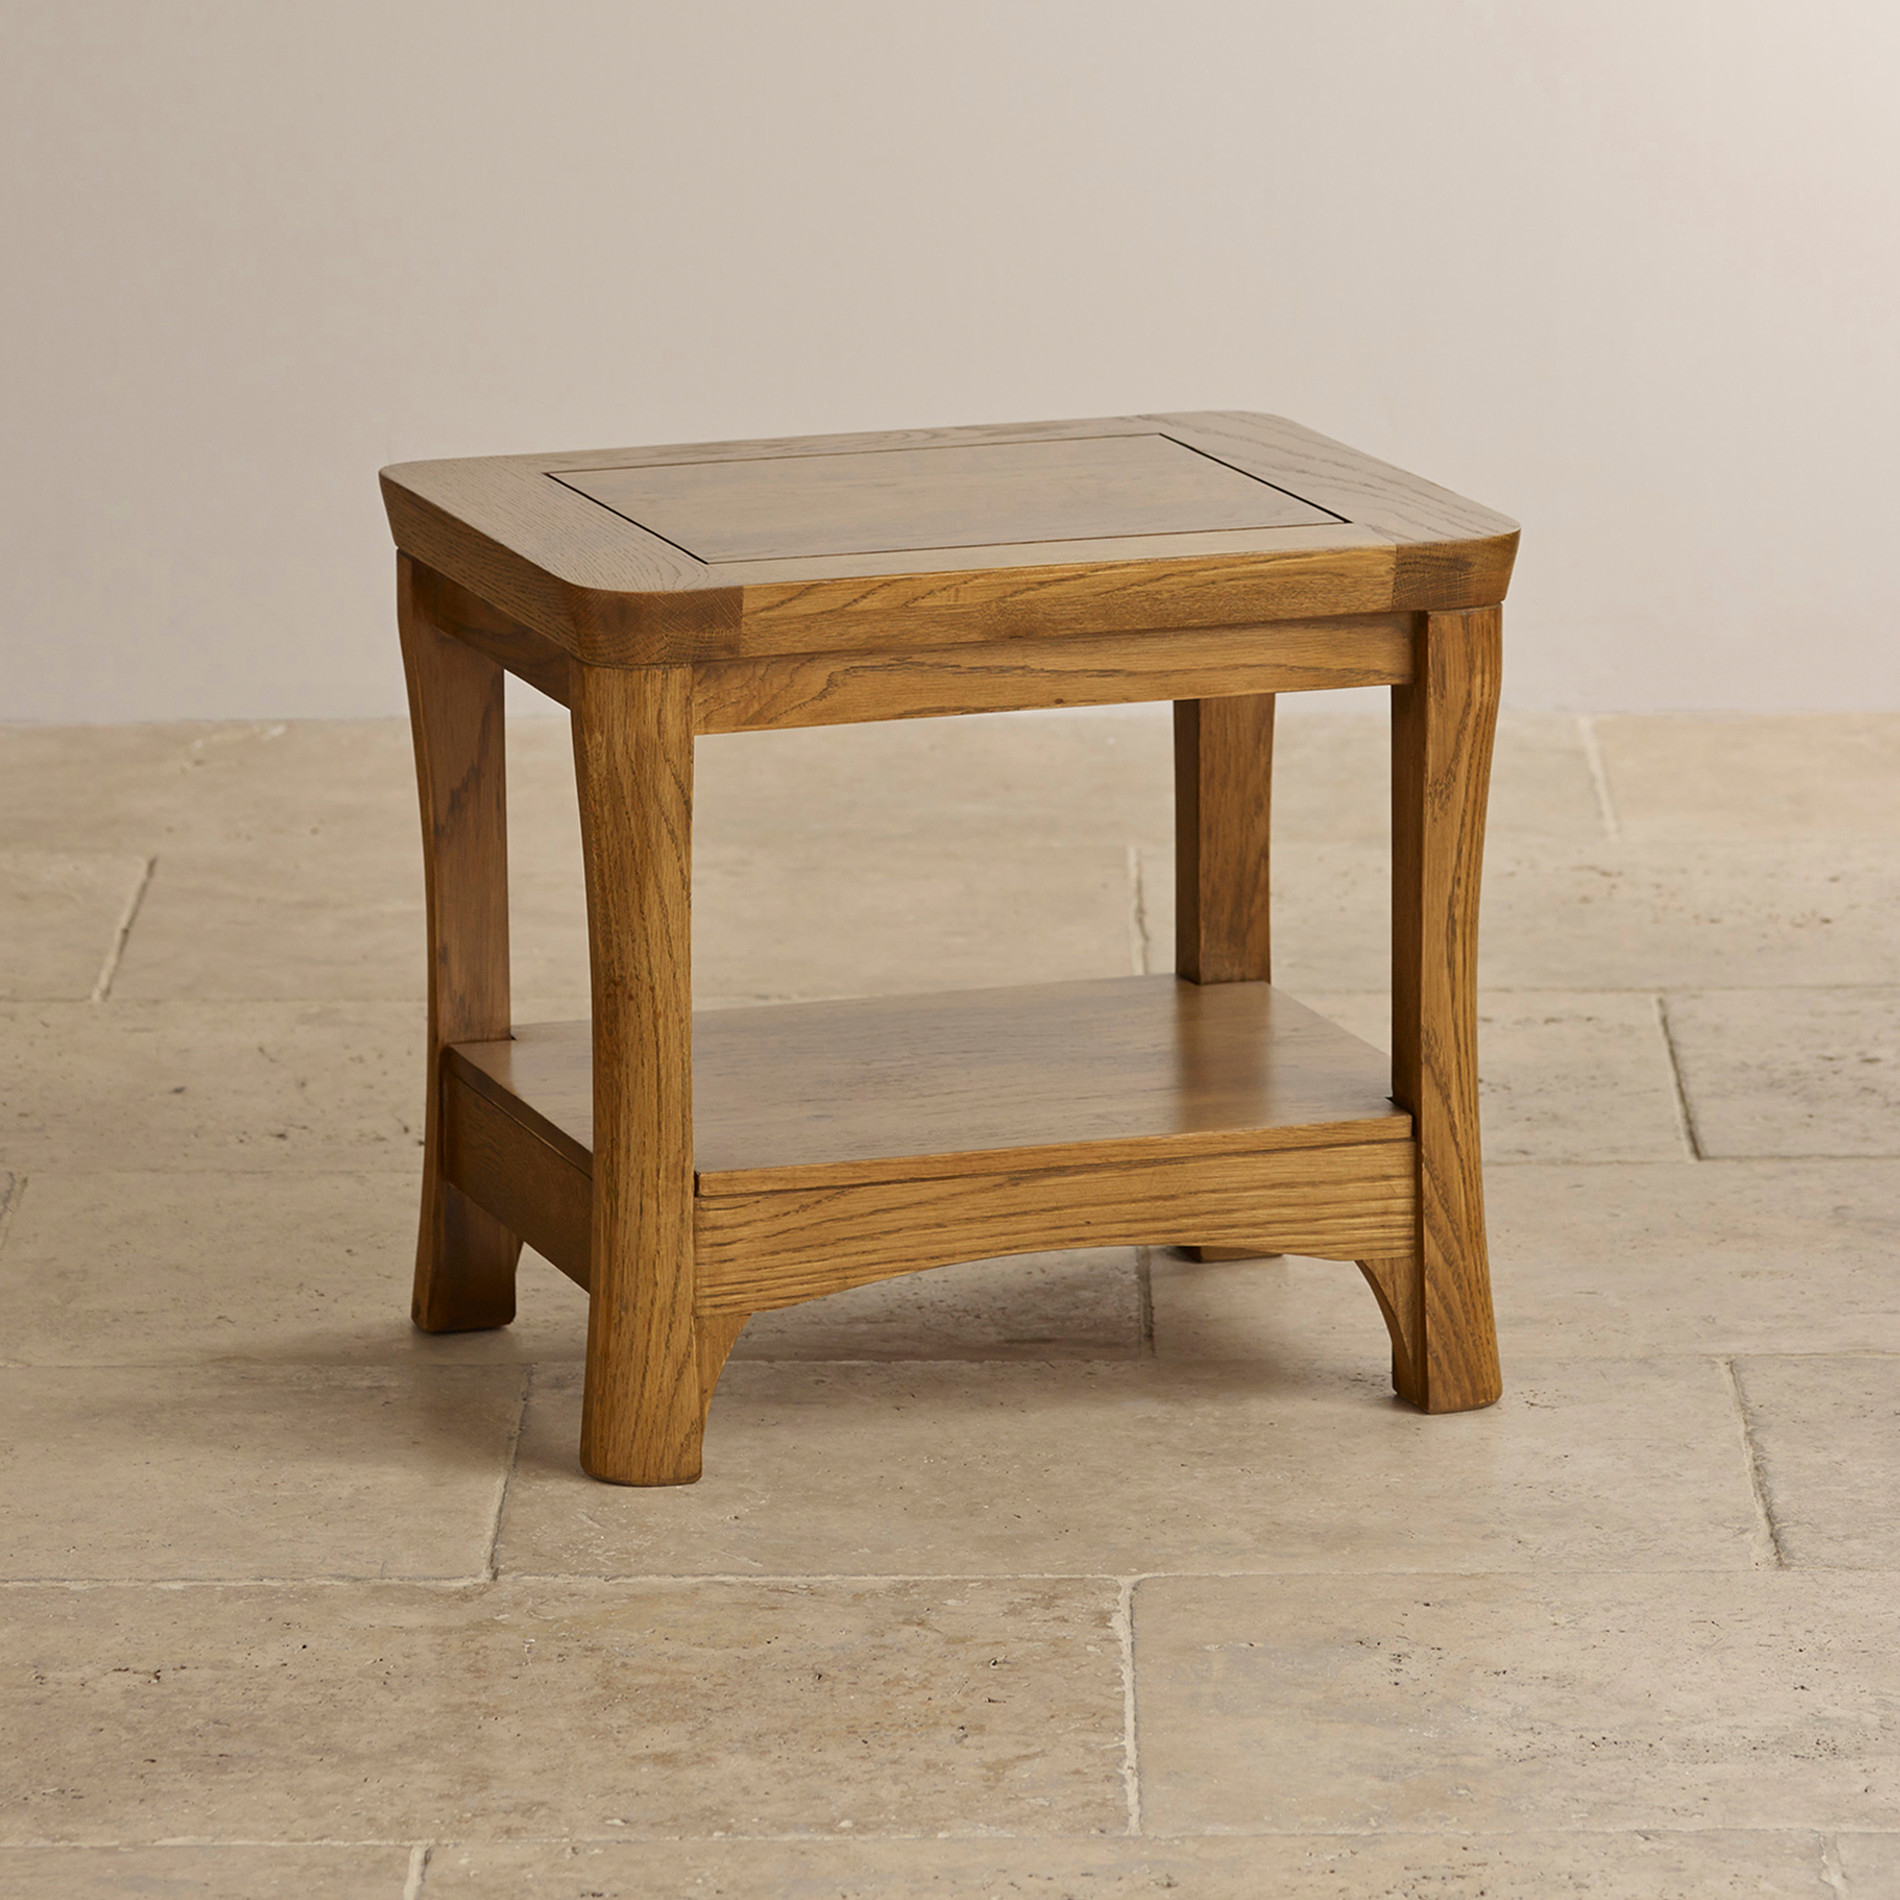 lamp tables orrick lamp table in rustic solid oak | oak furniture land HVBTDMA